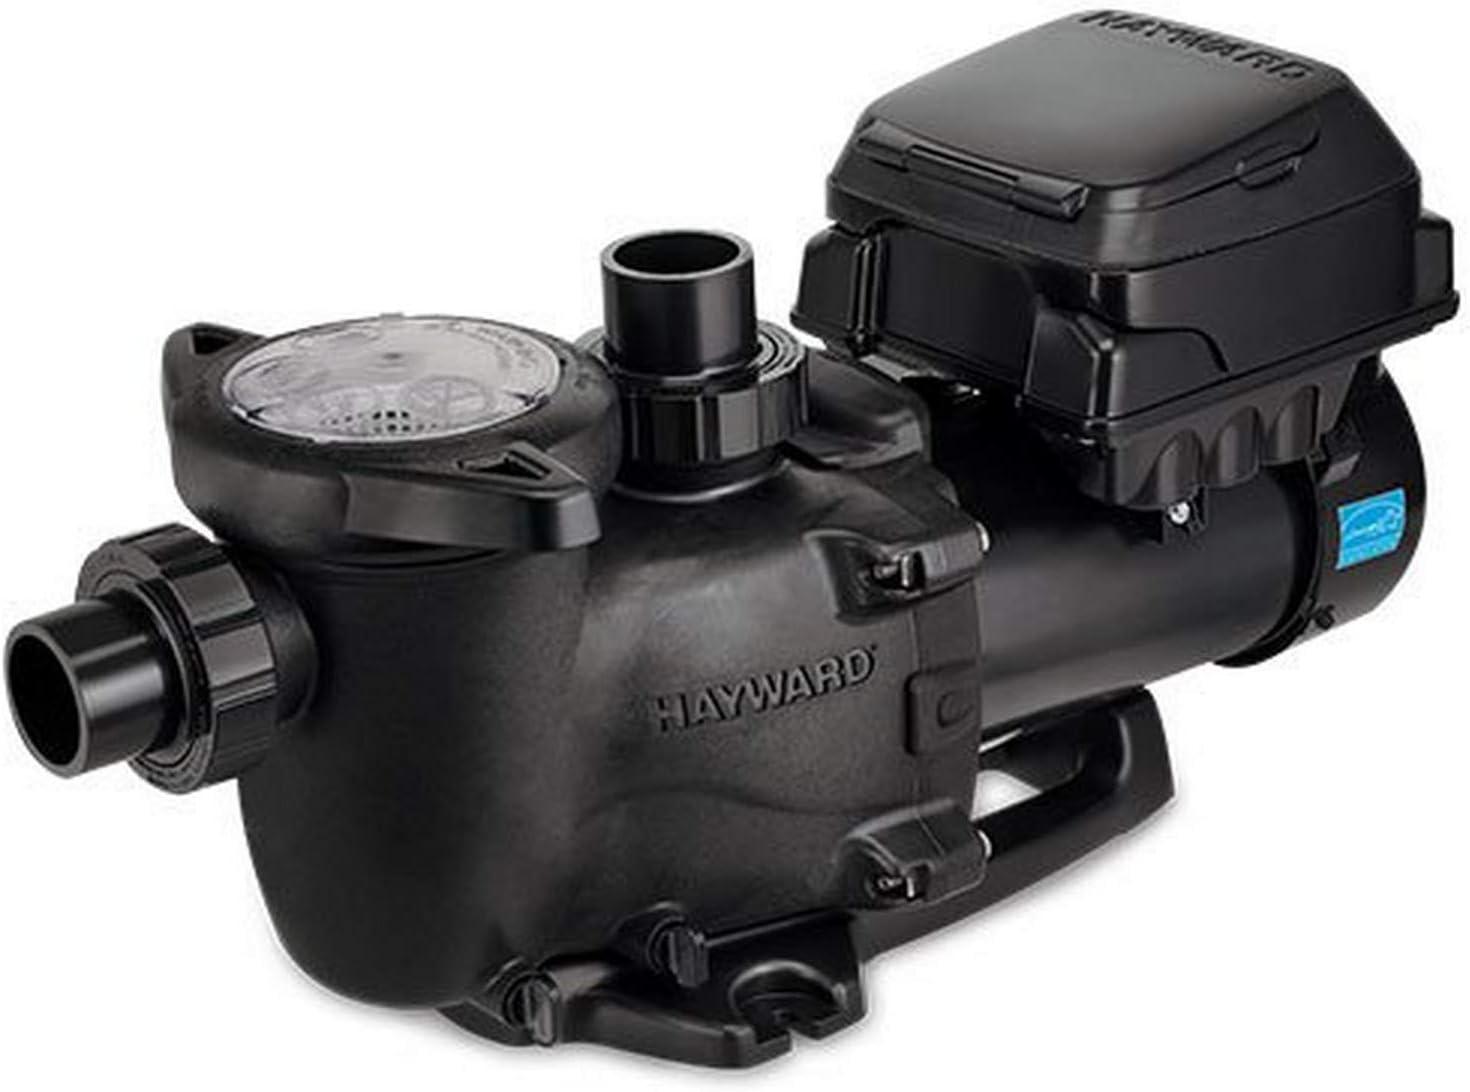 Hayward Max-Flo VS Pool Pump